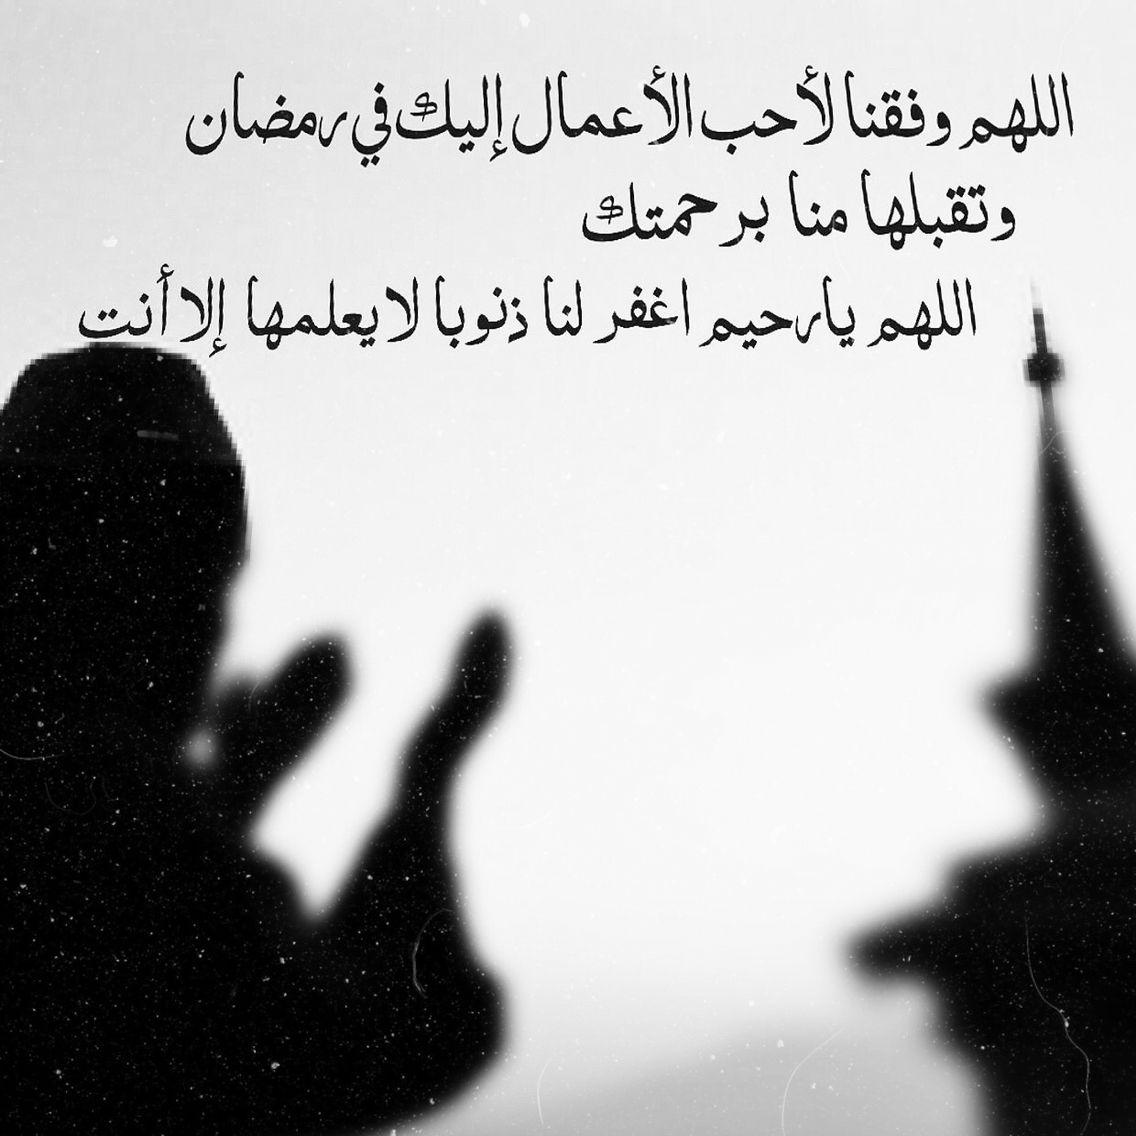 Pin By أدعية وأذكار On ذكر Okay Gesture Calligraphy Arabic Calligraphy